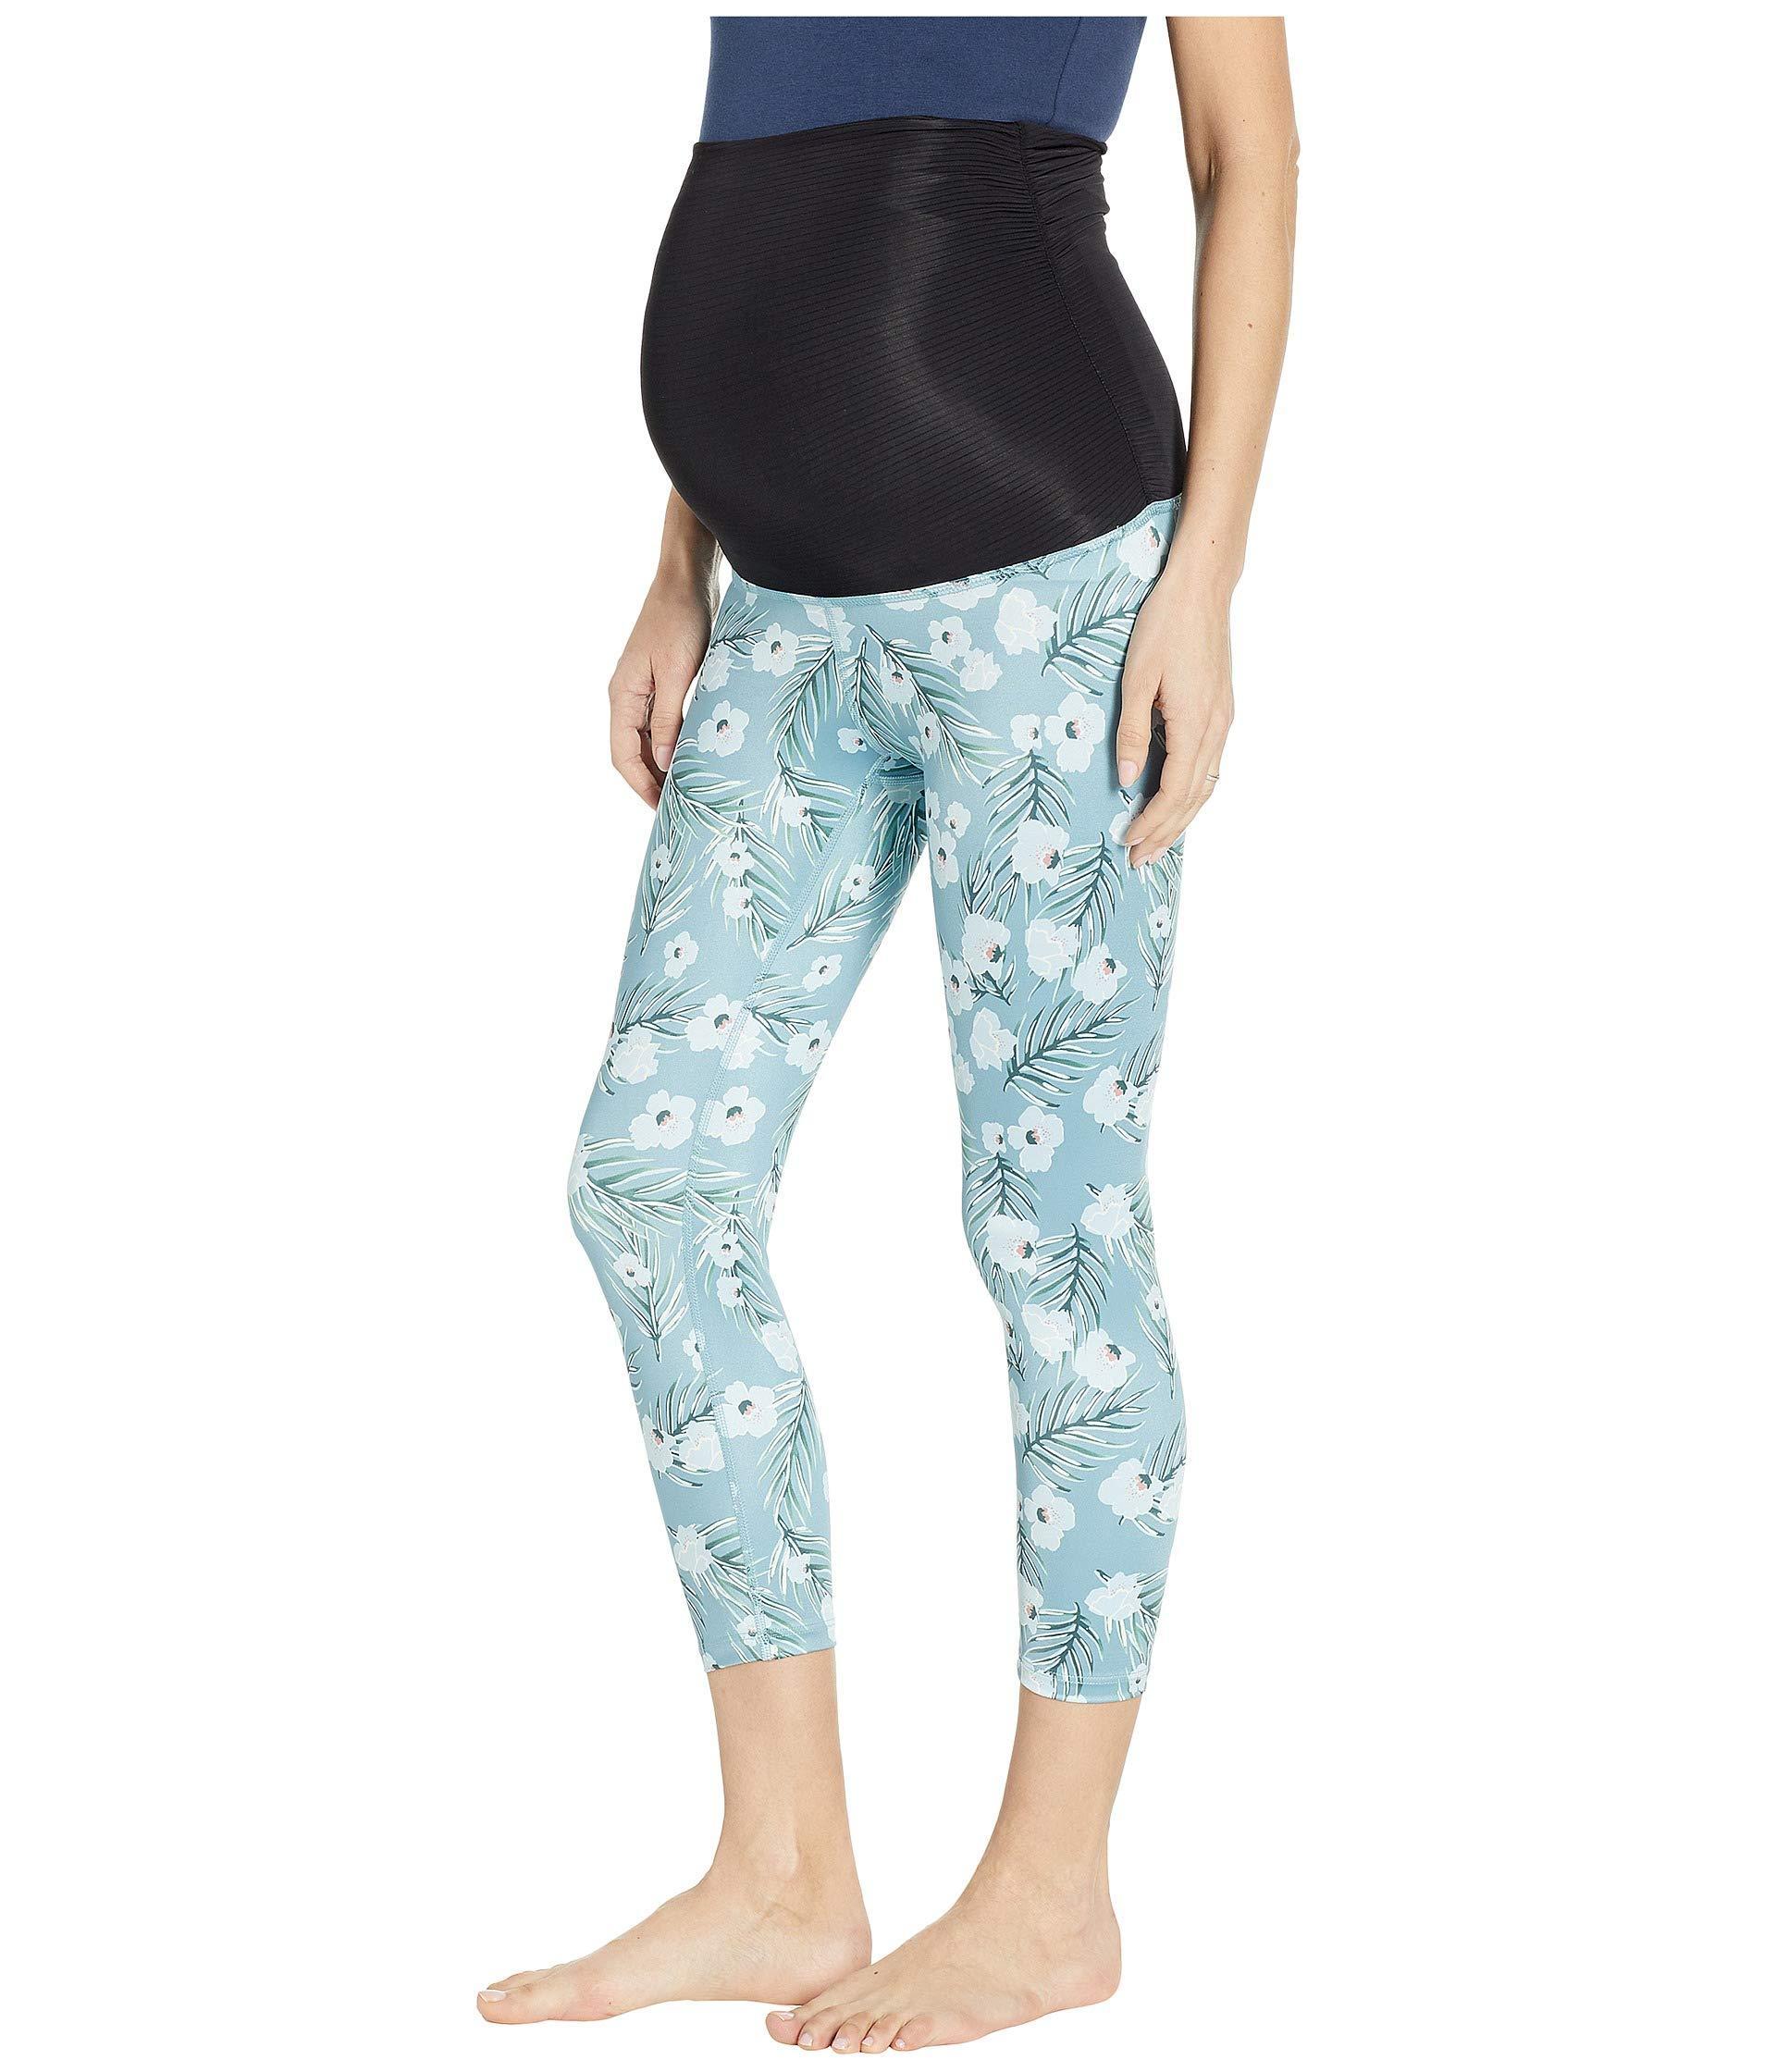 02555d1bde619a Beyond Yoga Fold Down Maternity Capri Leggings (sky Blossoms) Women's  Casual Pants in Blue - Lyst